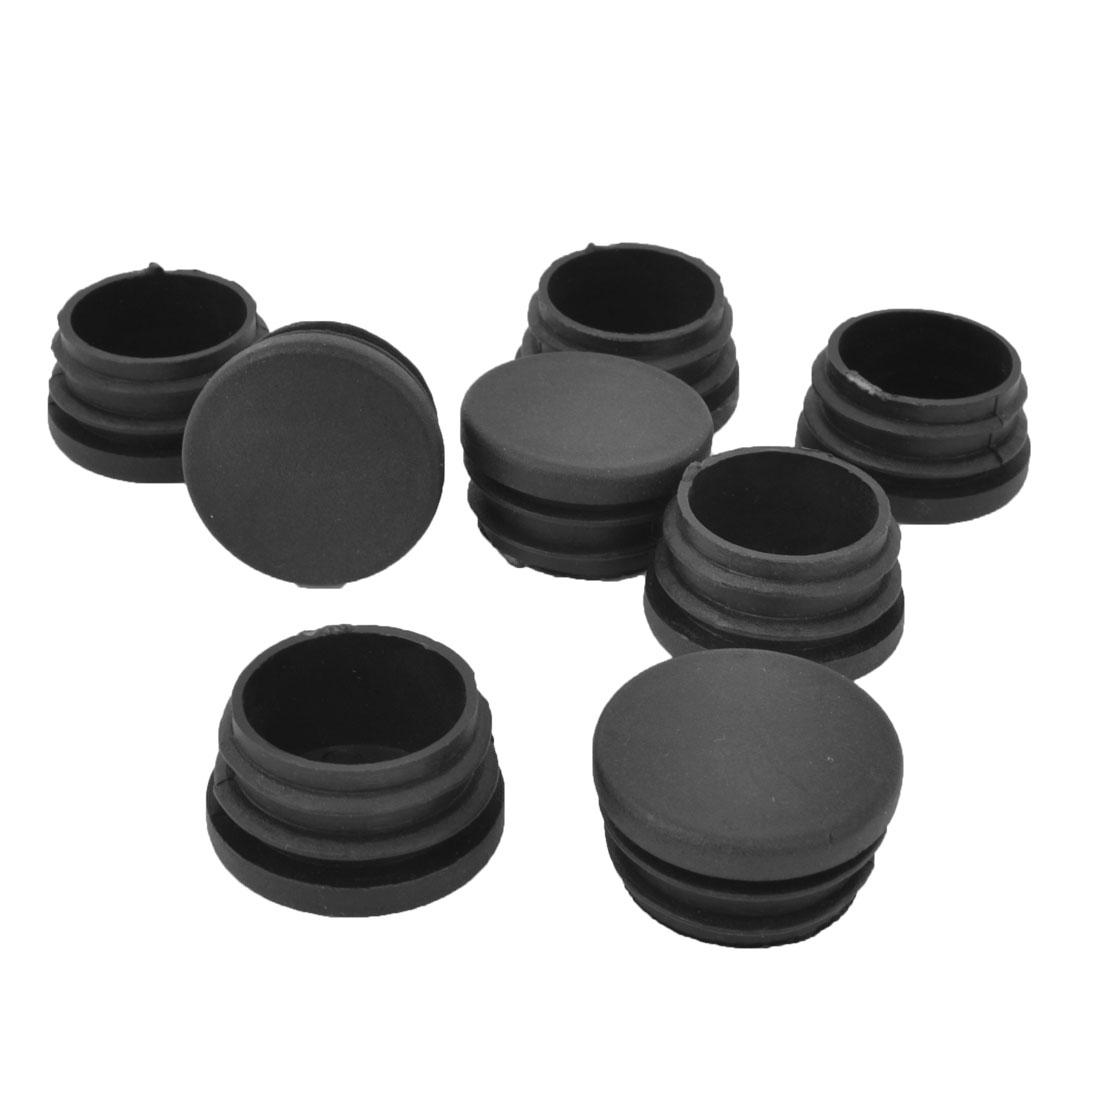 32mm Black Hard Plastic Tubing Tube Insert Blanking End Caps 8Pcs